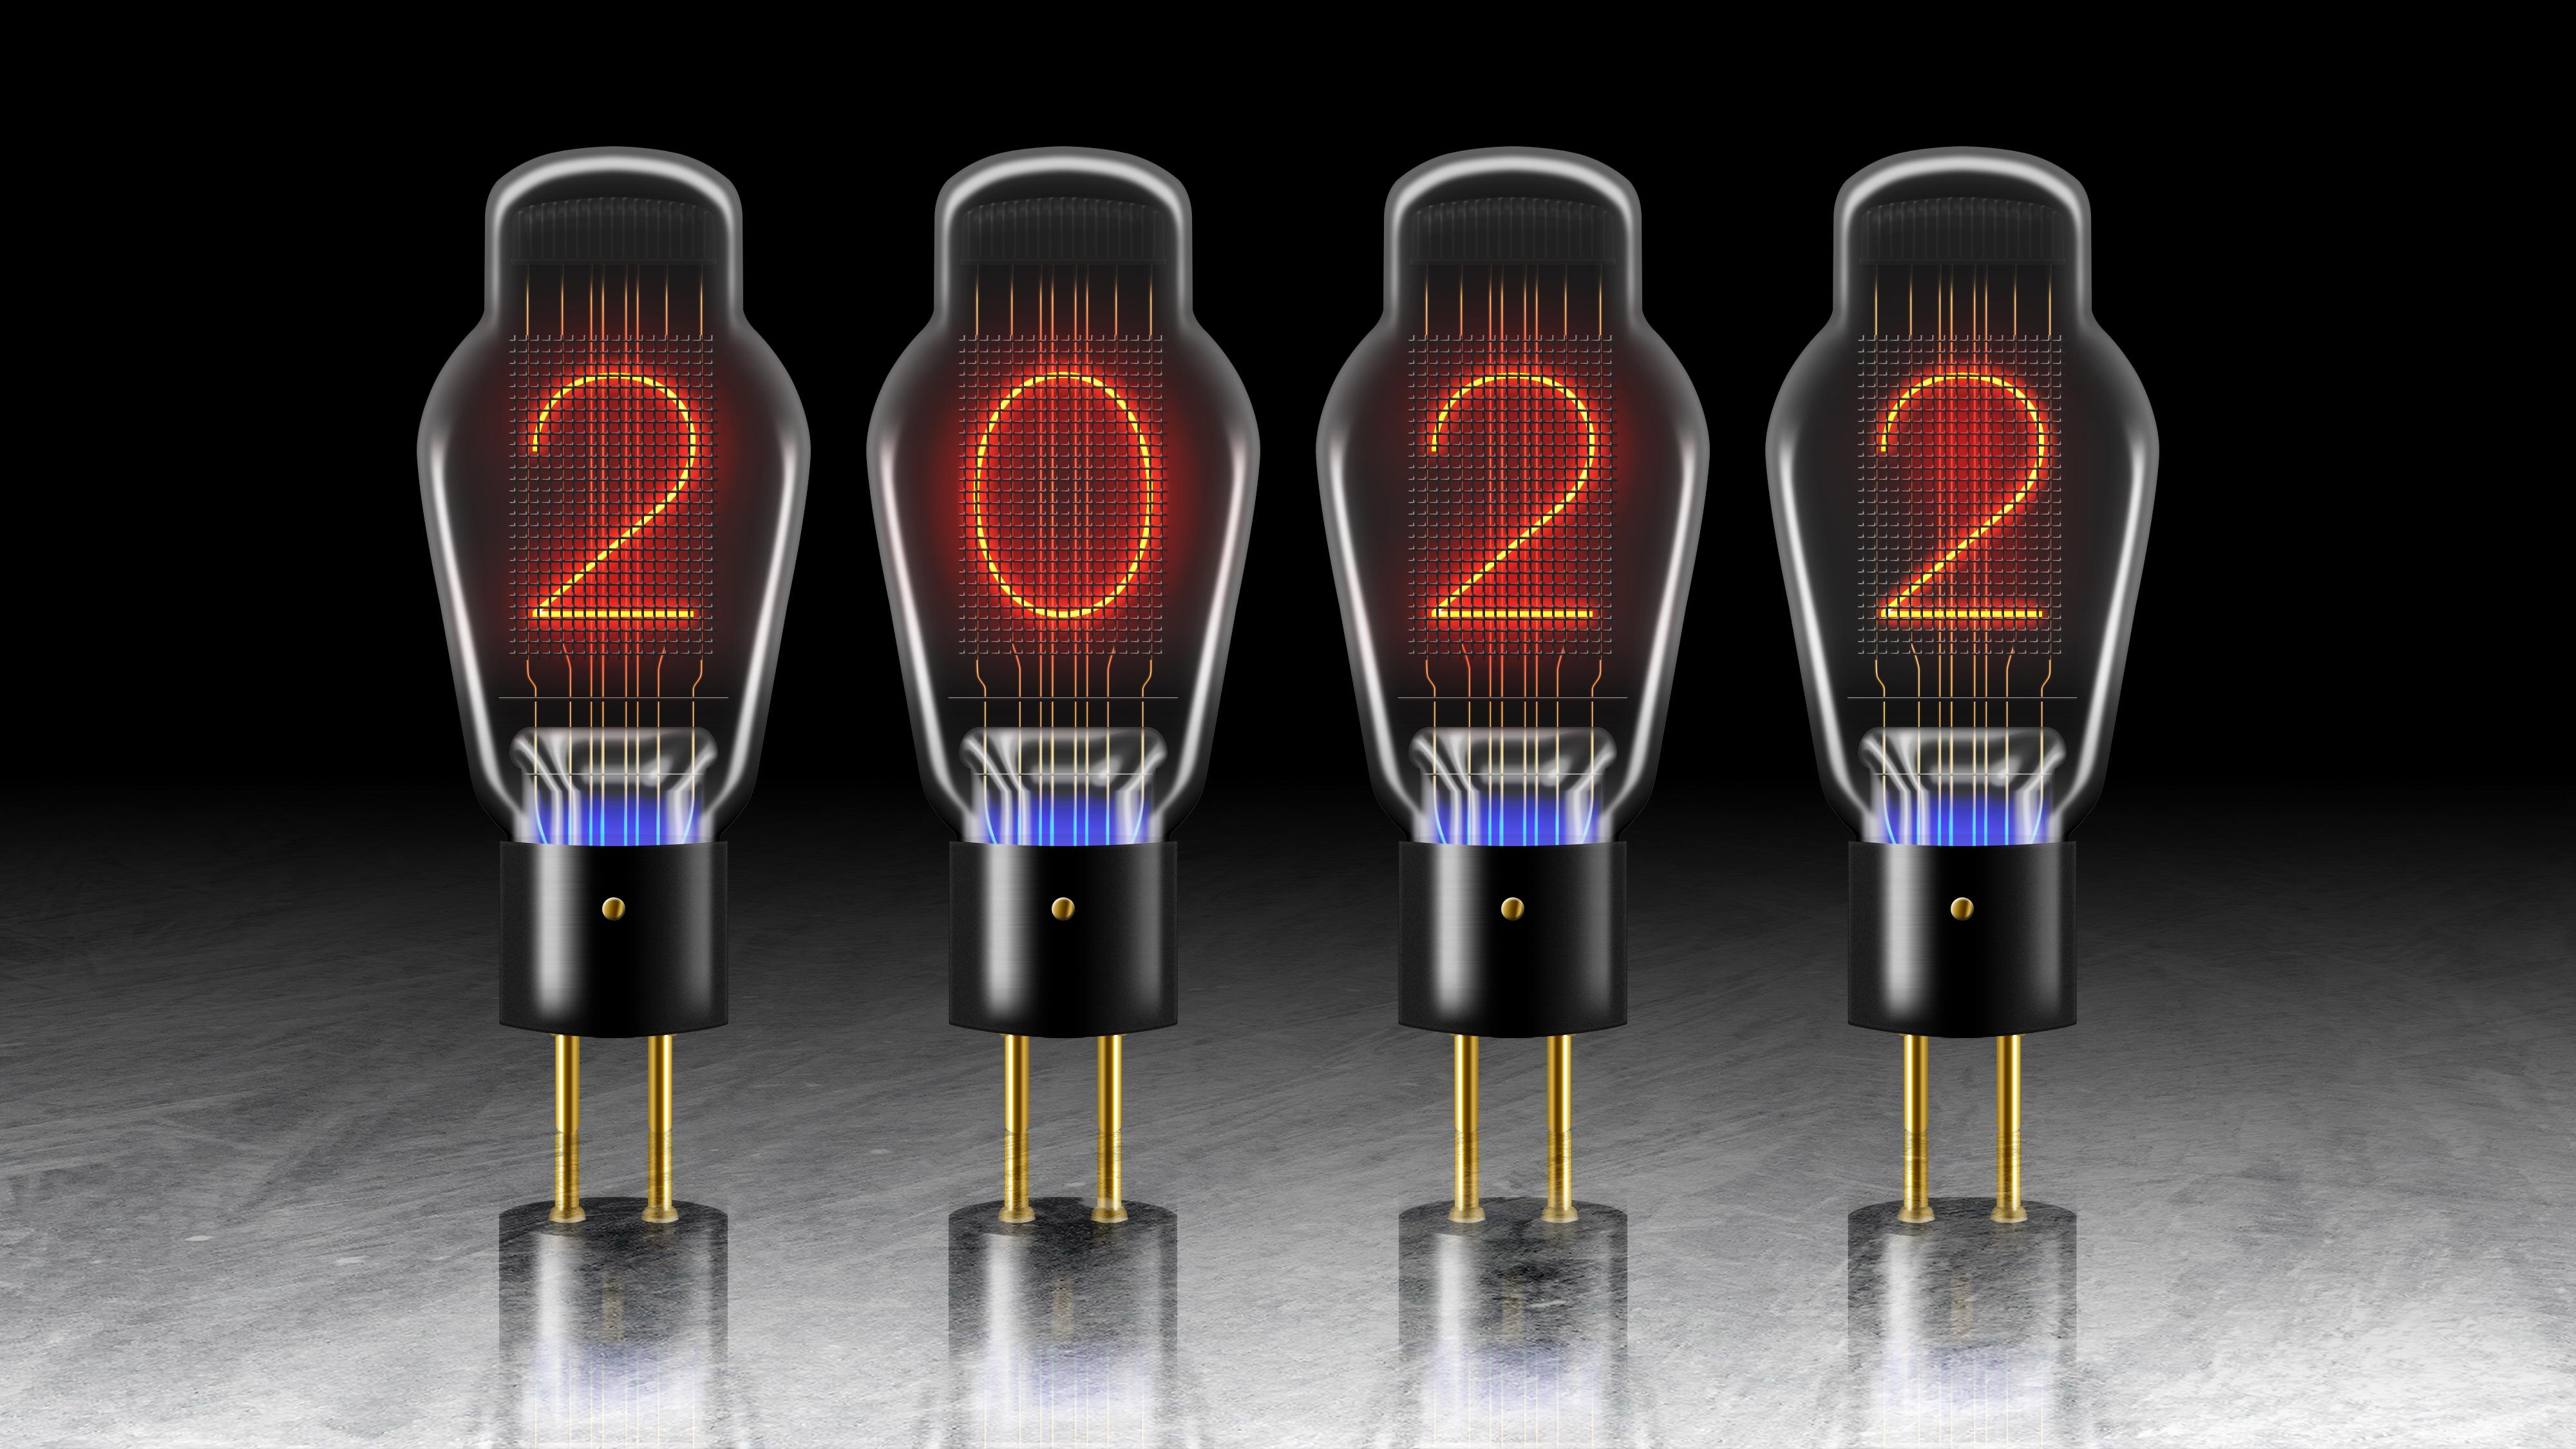 General 4000x2250 vacuum tubes 2022 (Year) Nixie Tubes